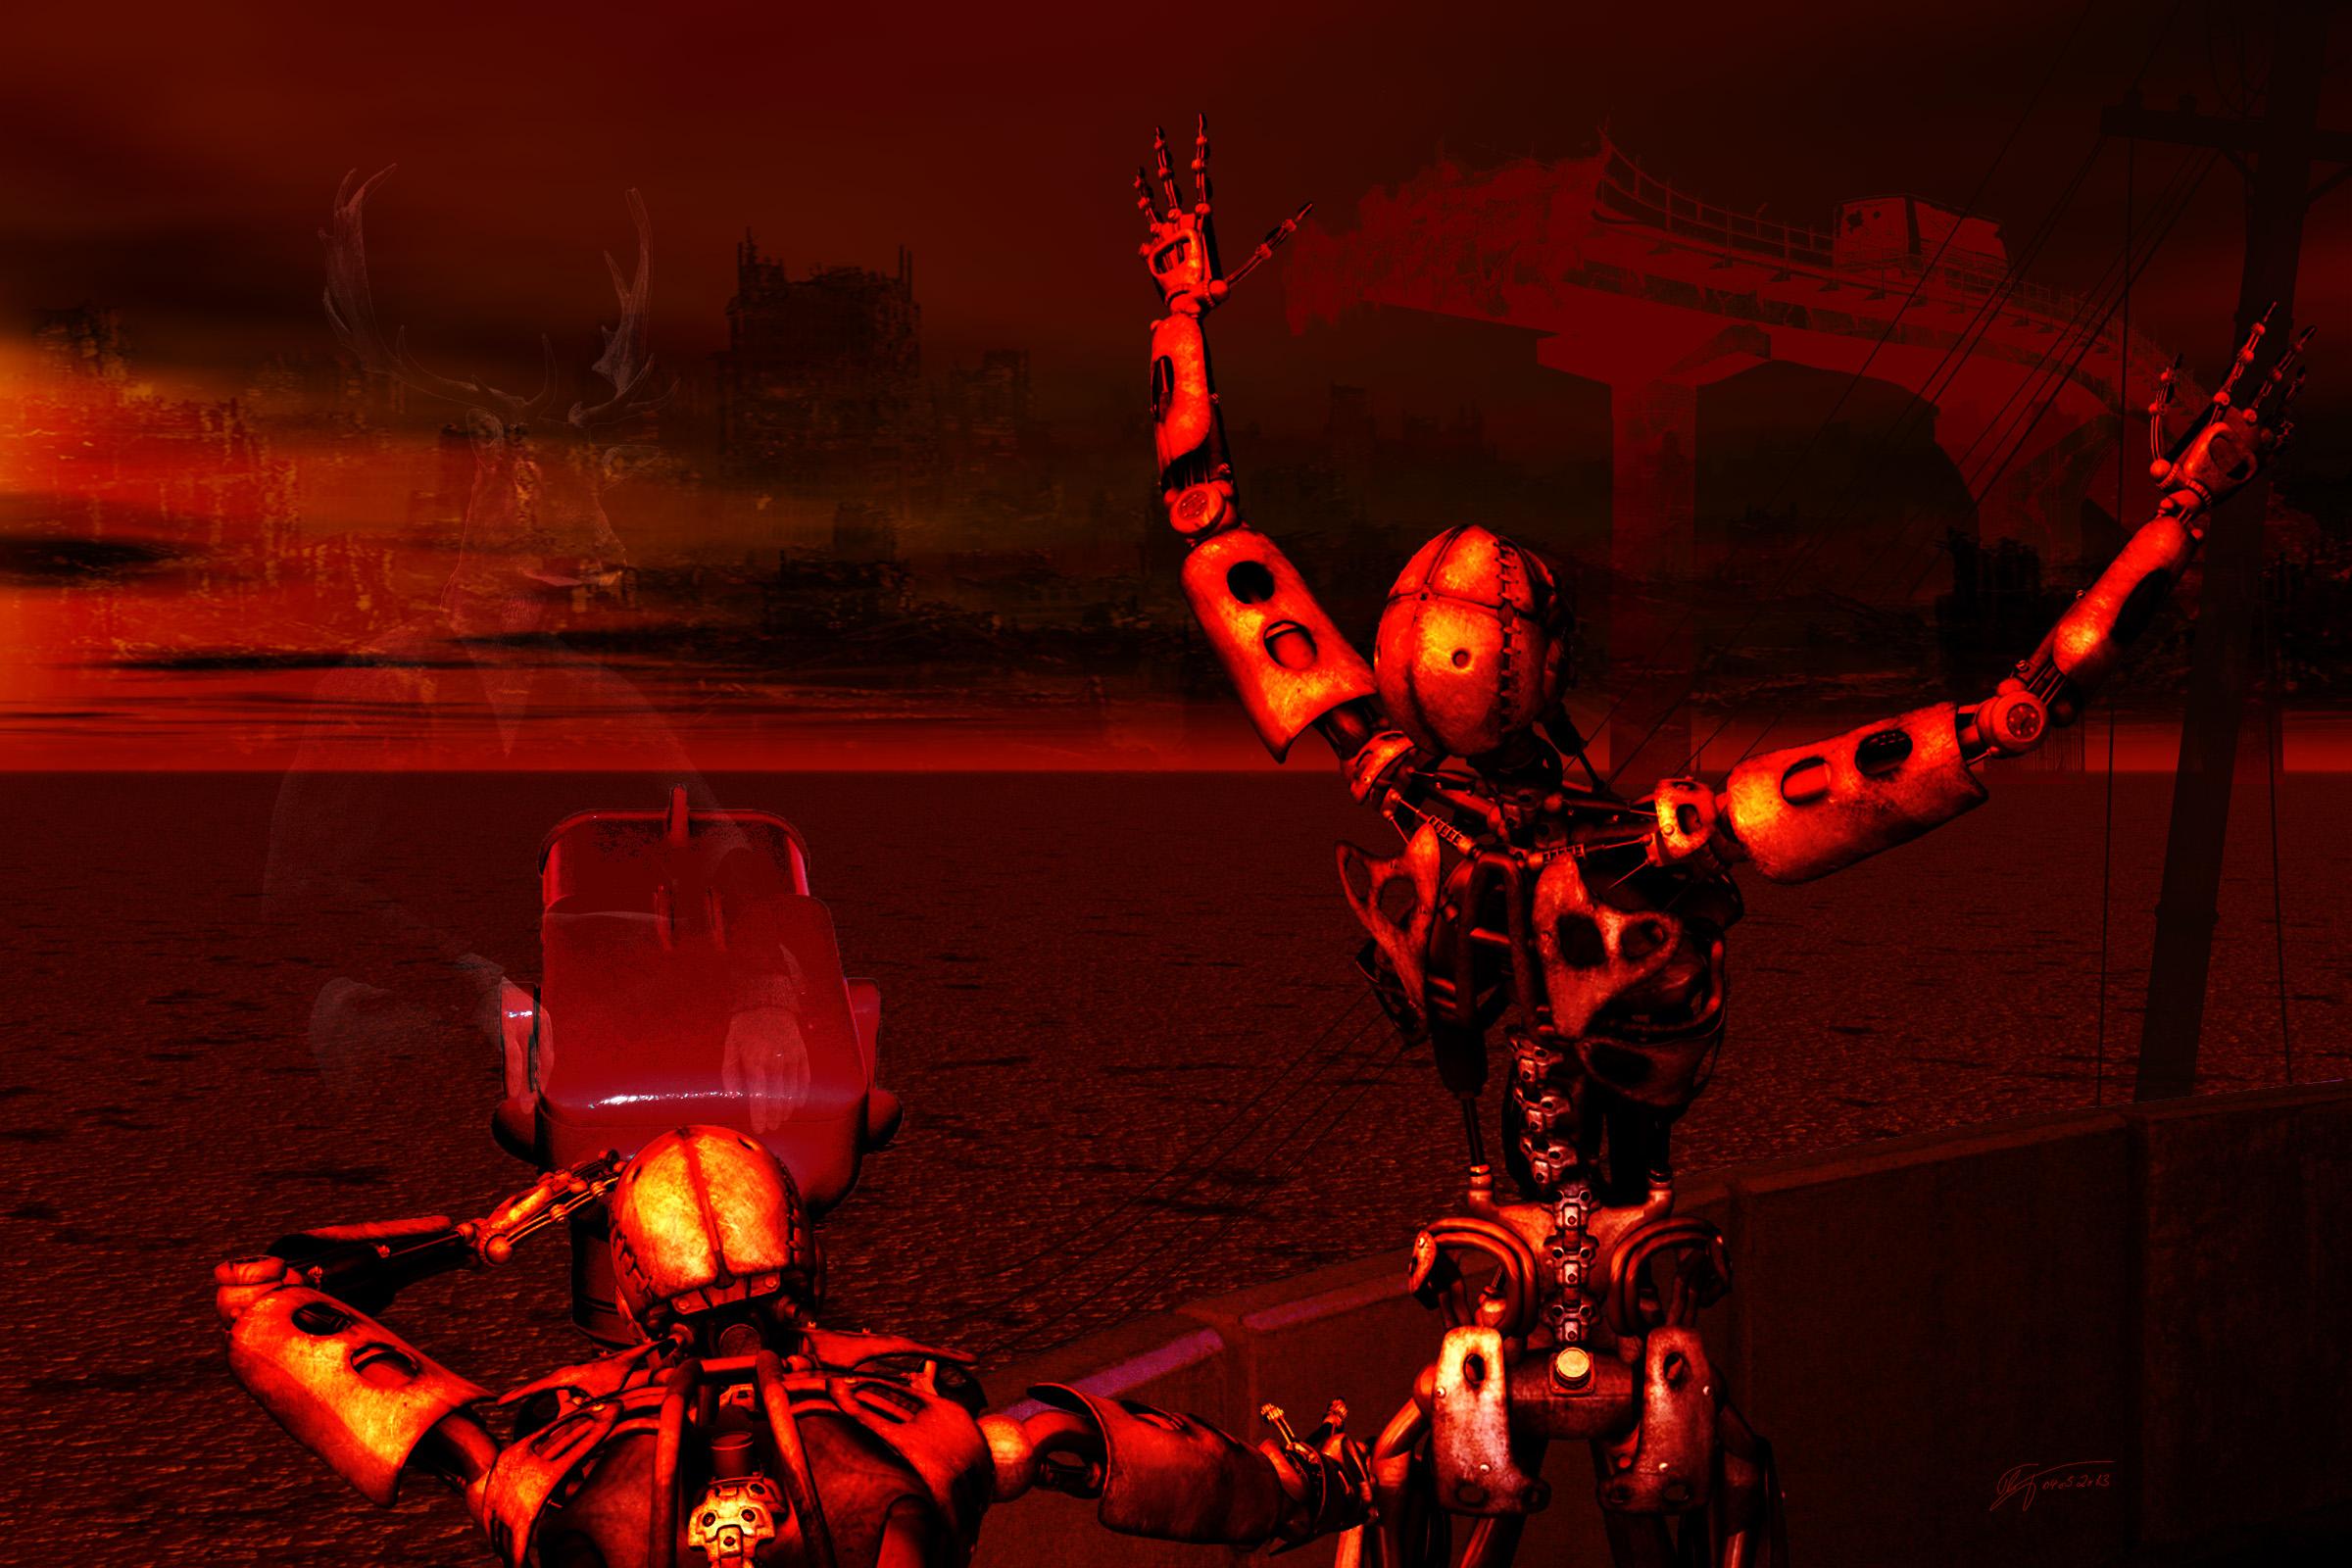 MWD 37; Contest; Cyborg; Destruction; Red